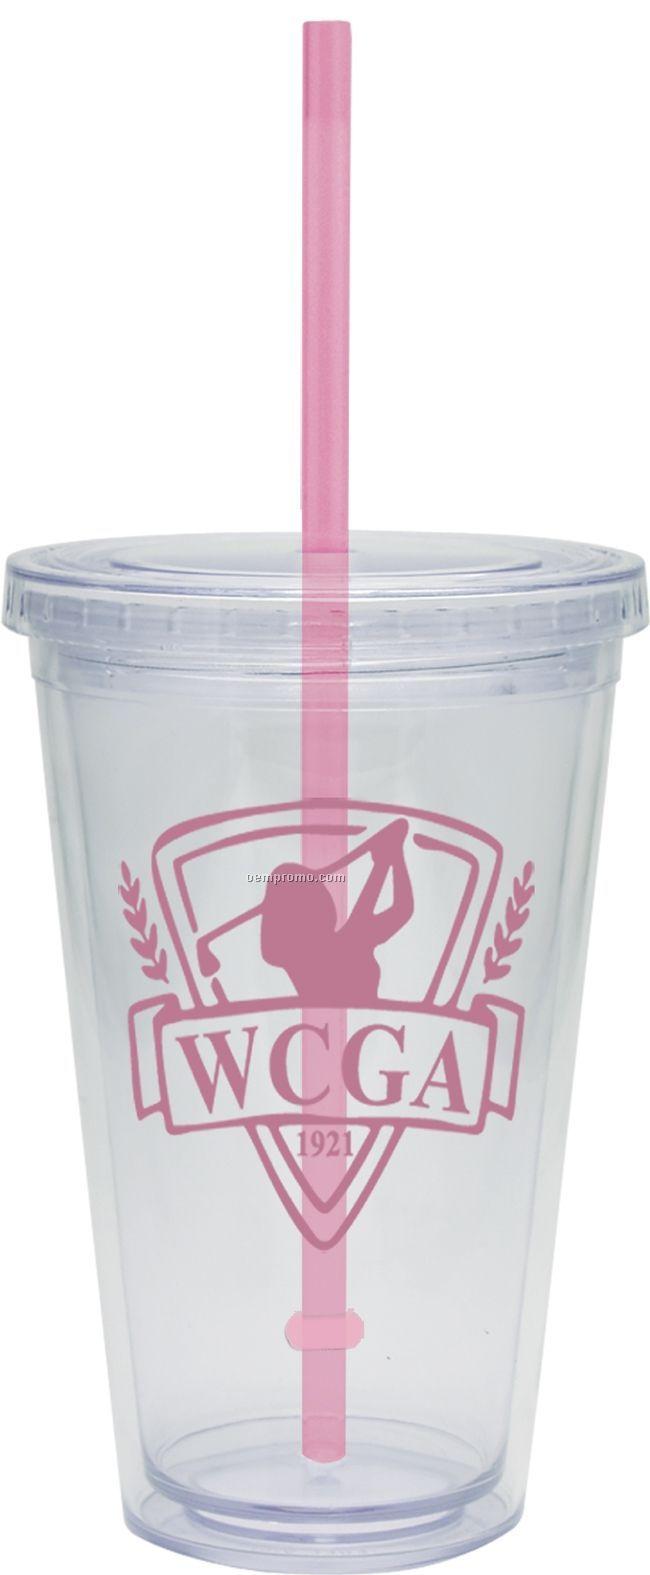 20 Oz. Carnival Cup W/ Pink Straw